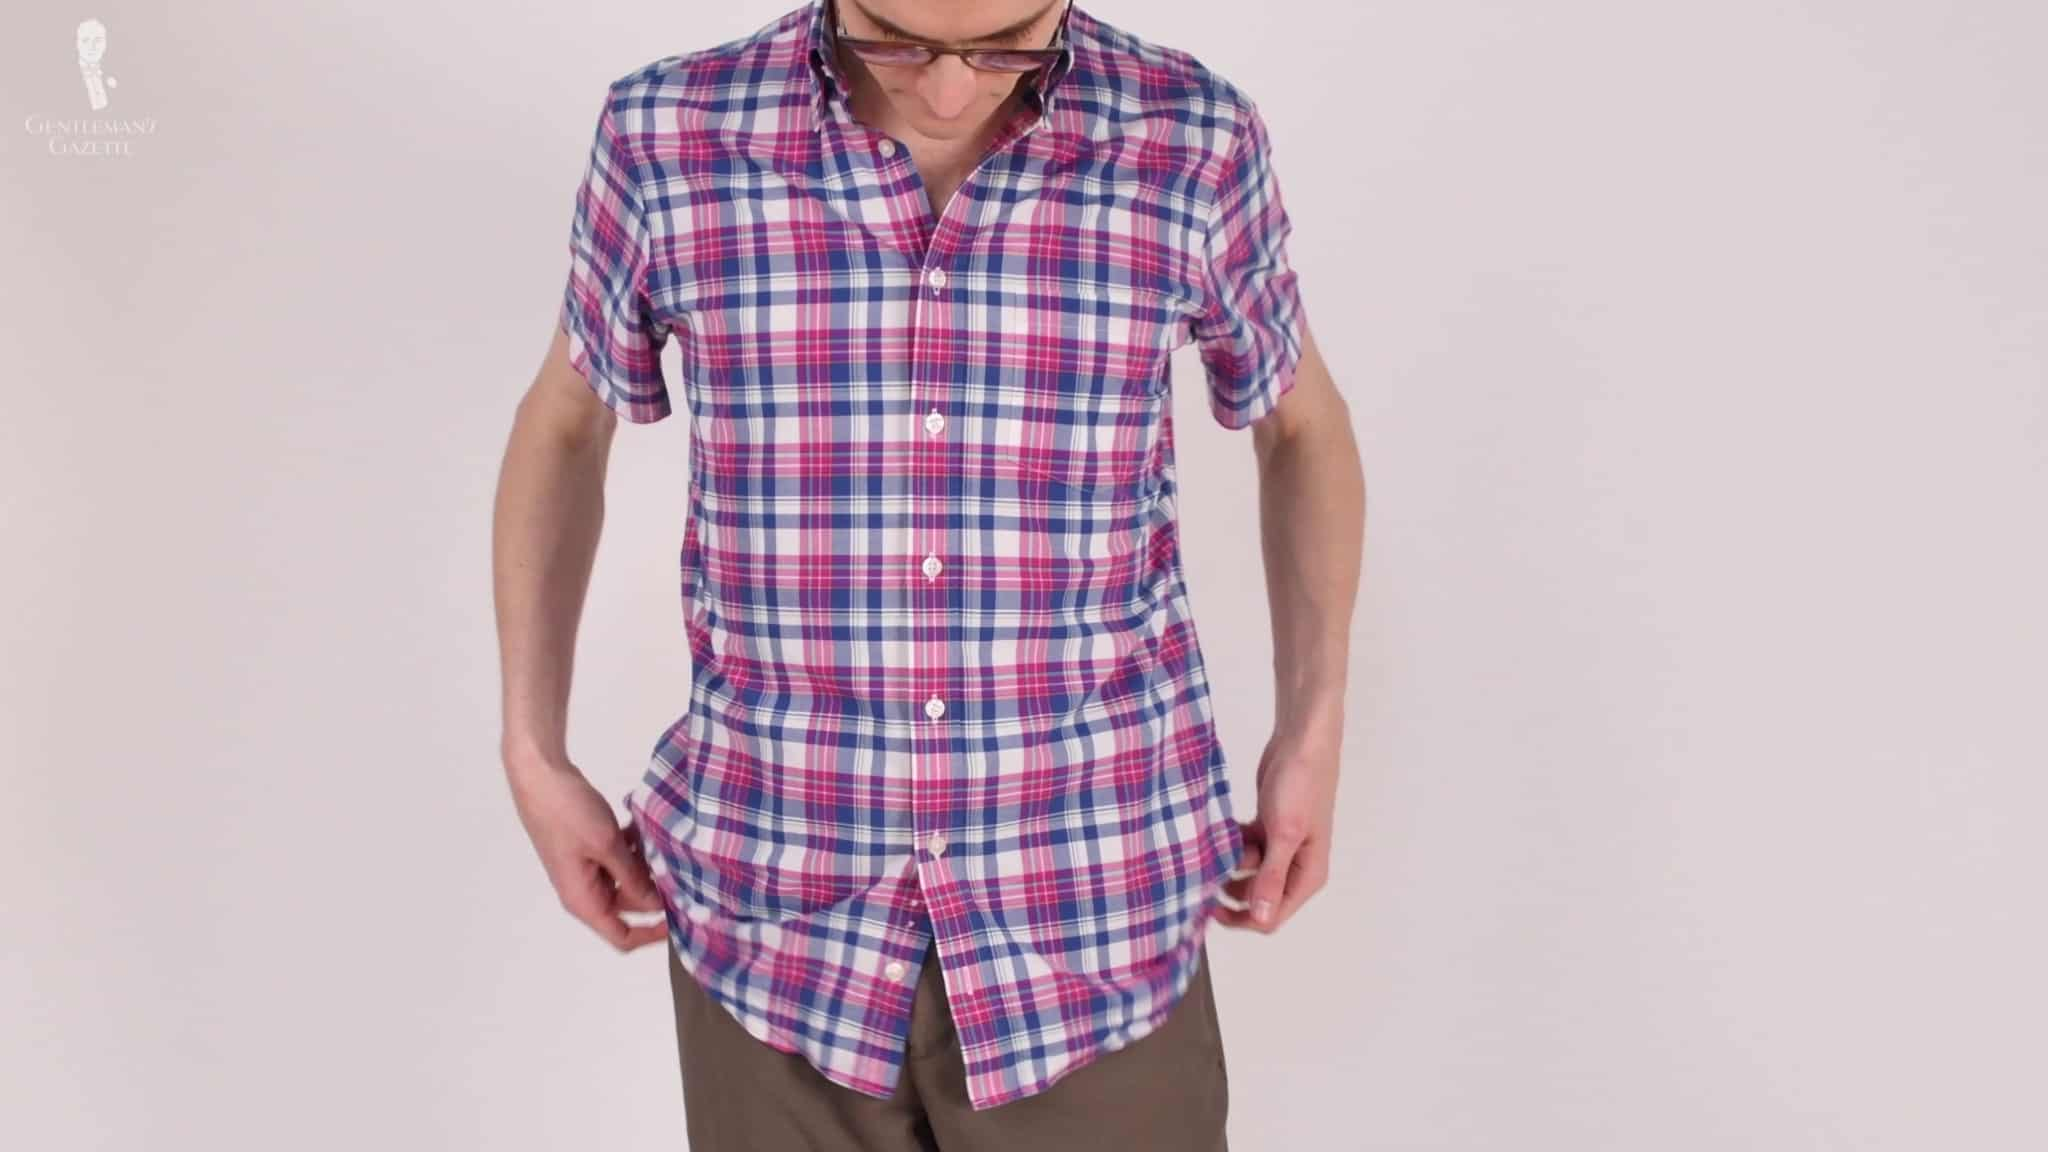 Preston wearing his Charles Tyrwhitt short-sleeved dress shirt.